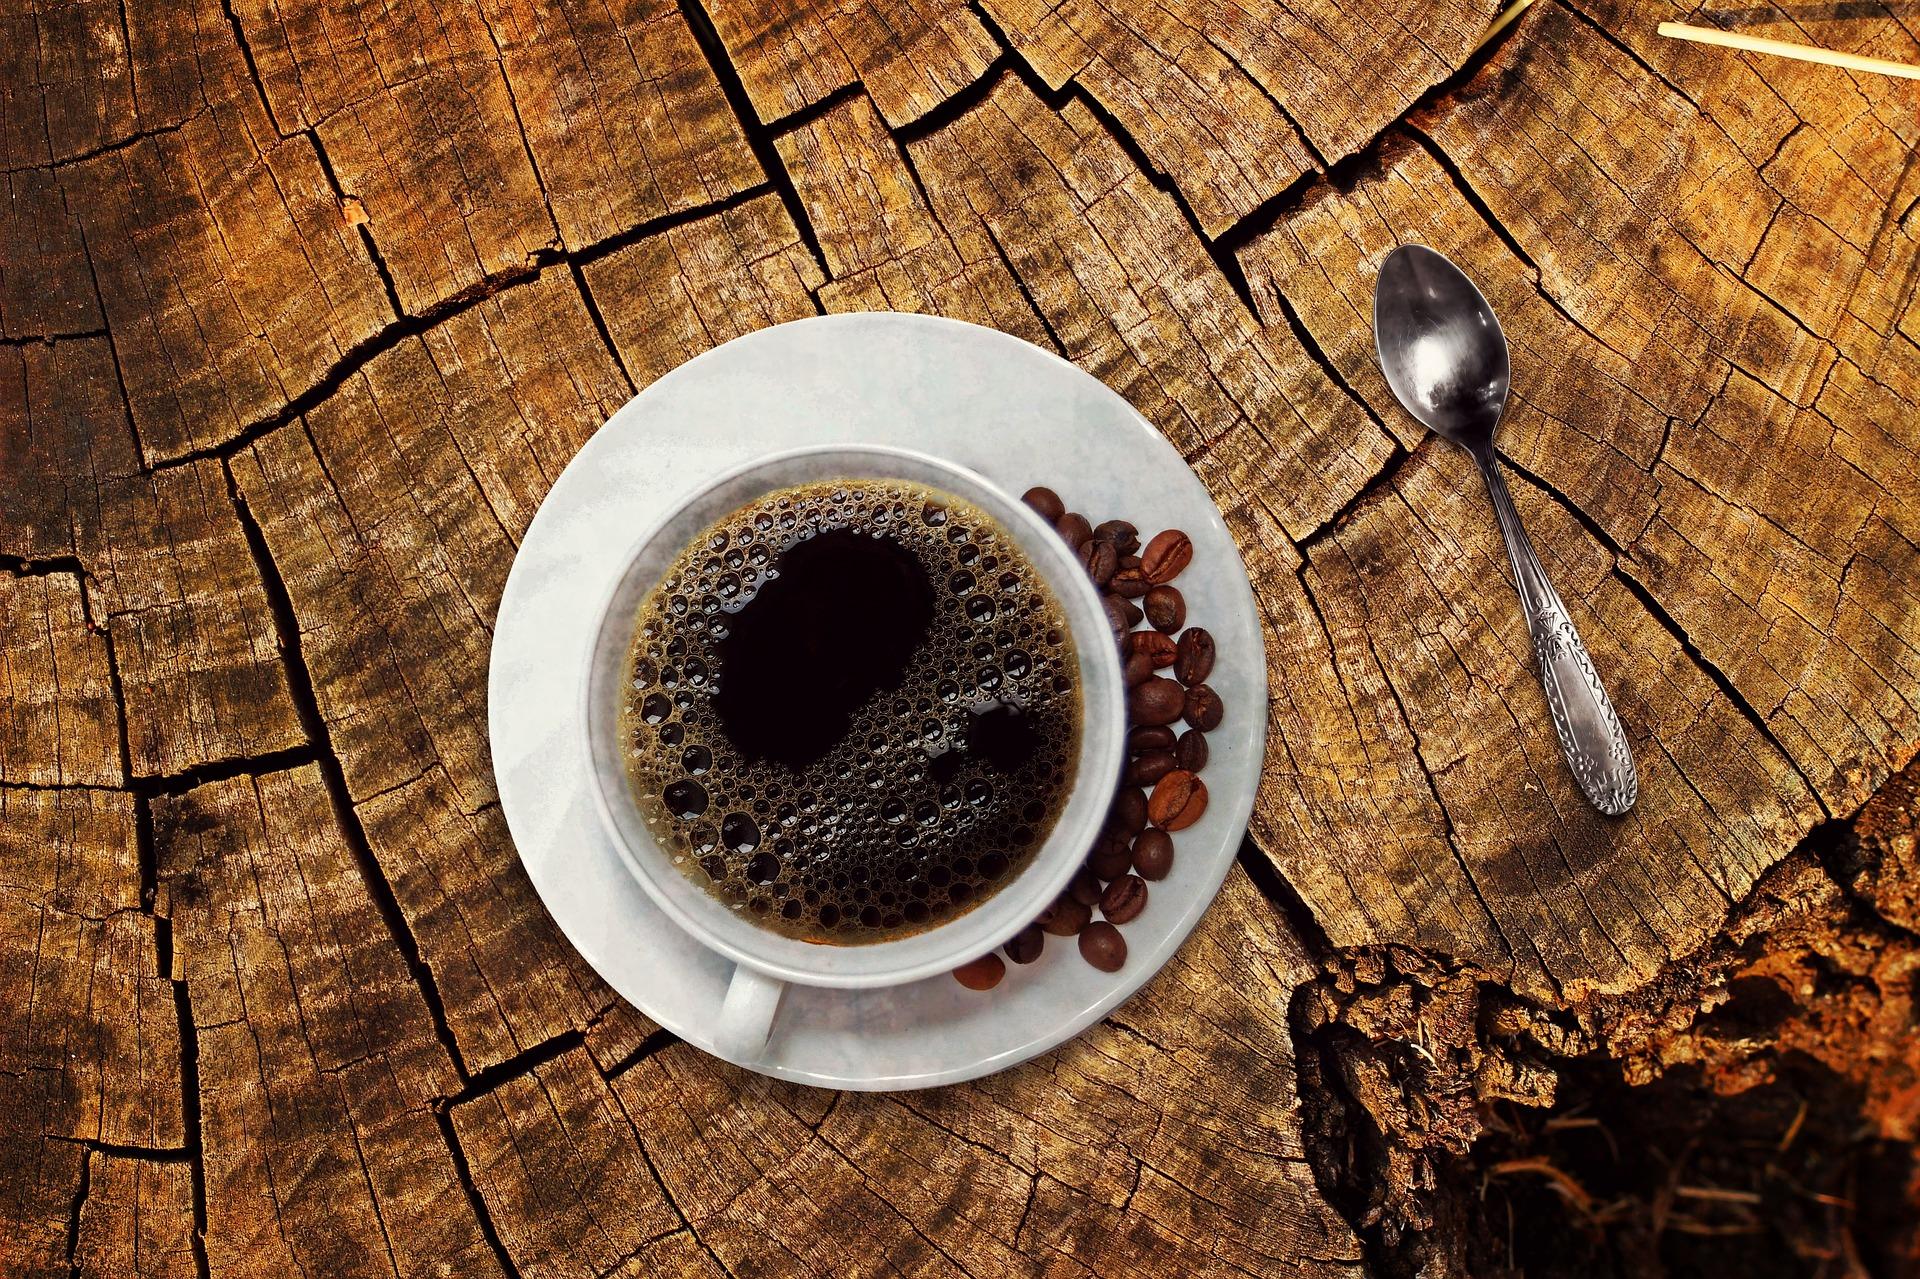 Kava za zdravo starost? Da!